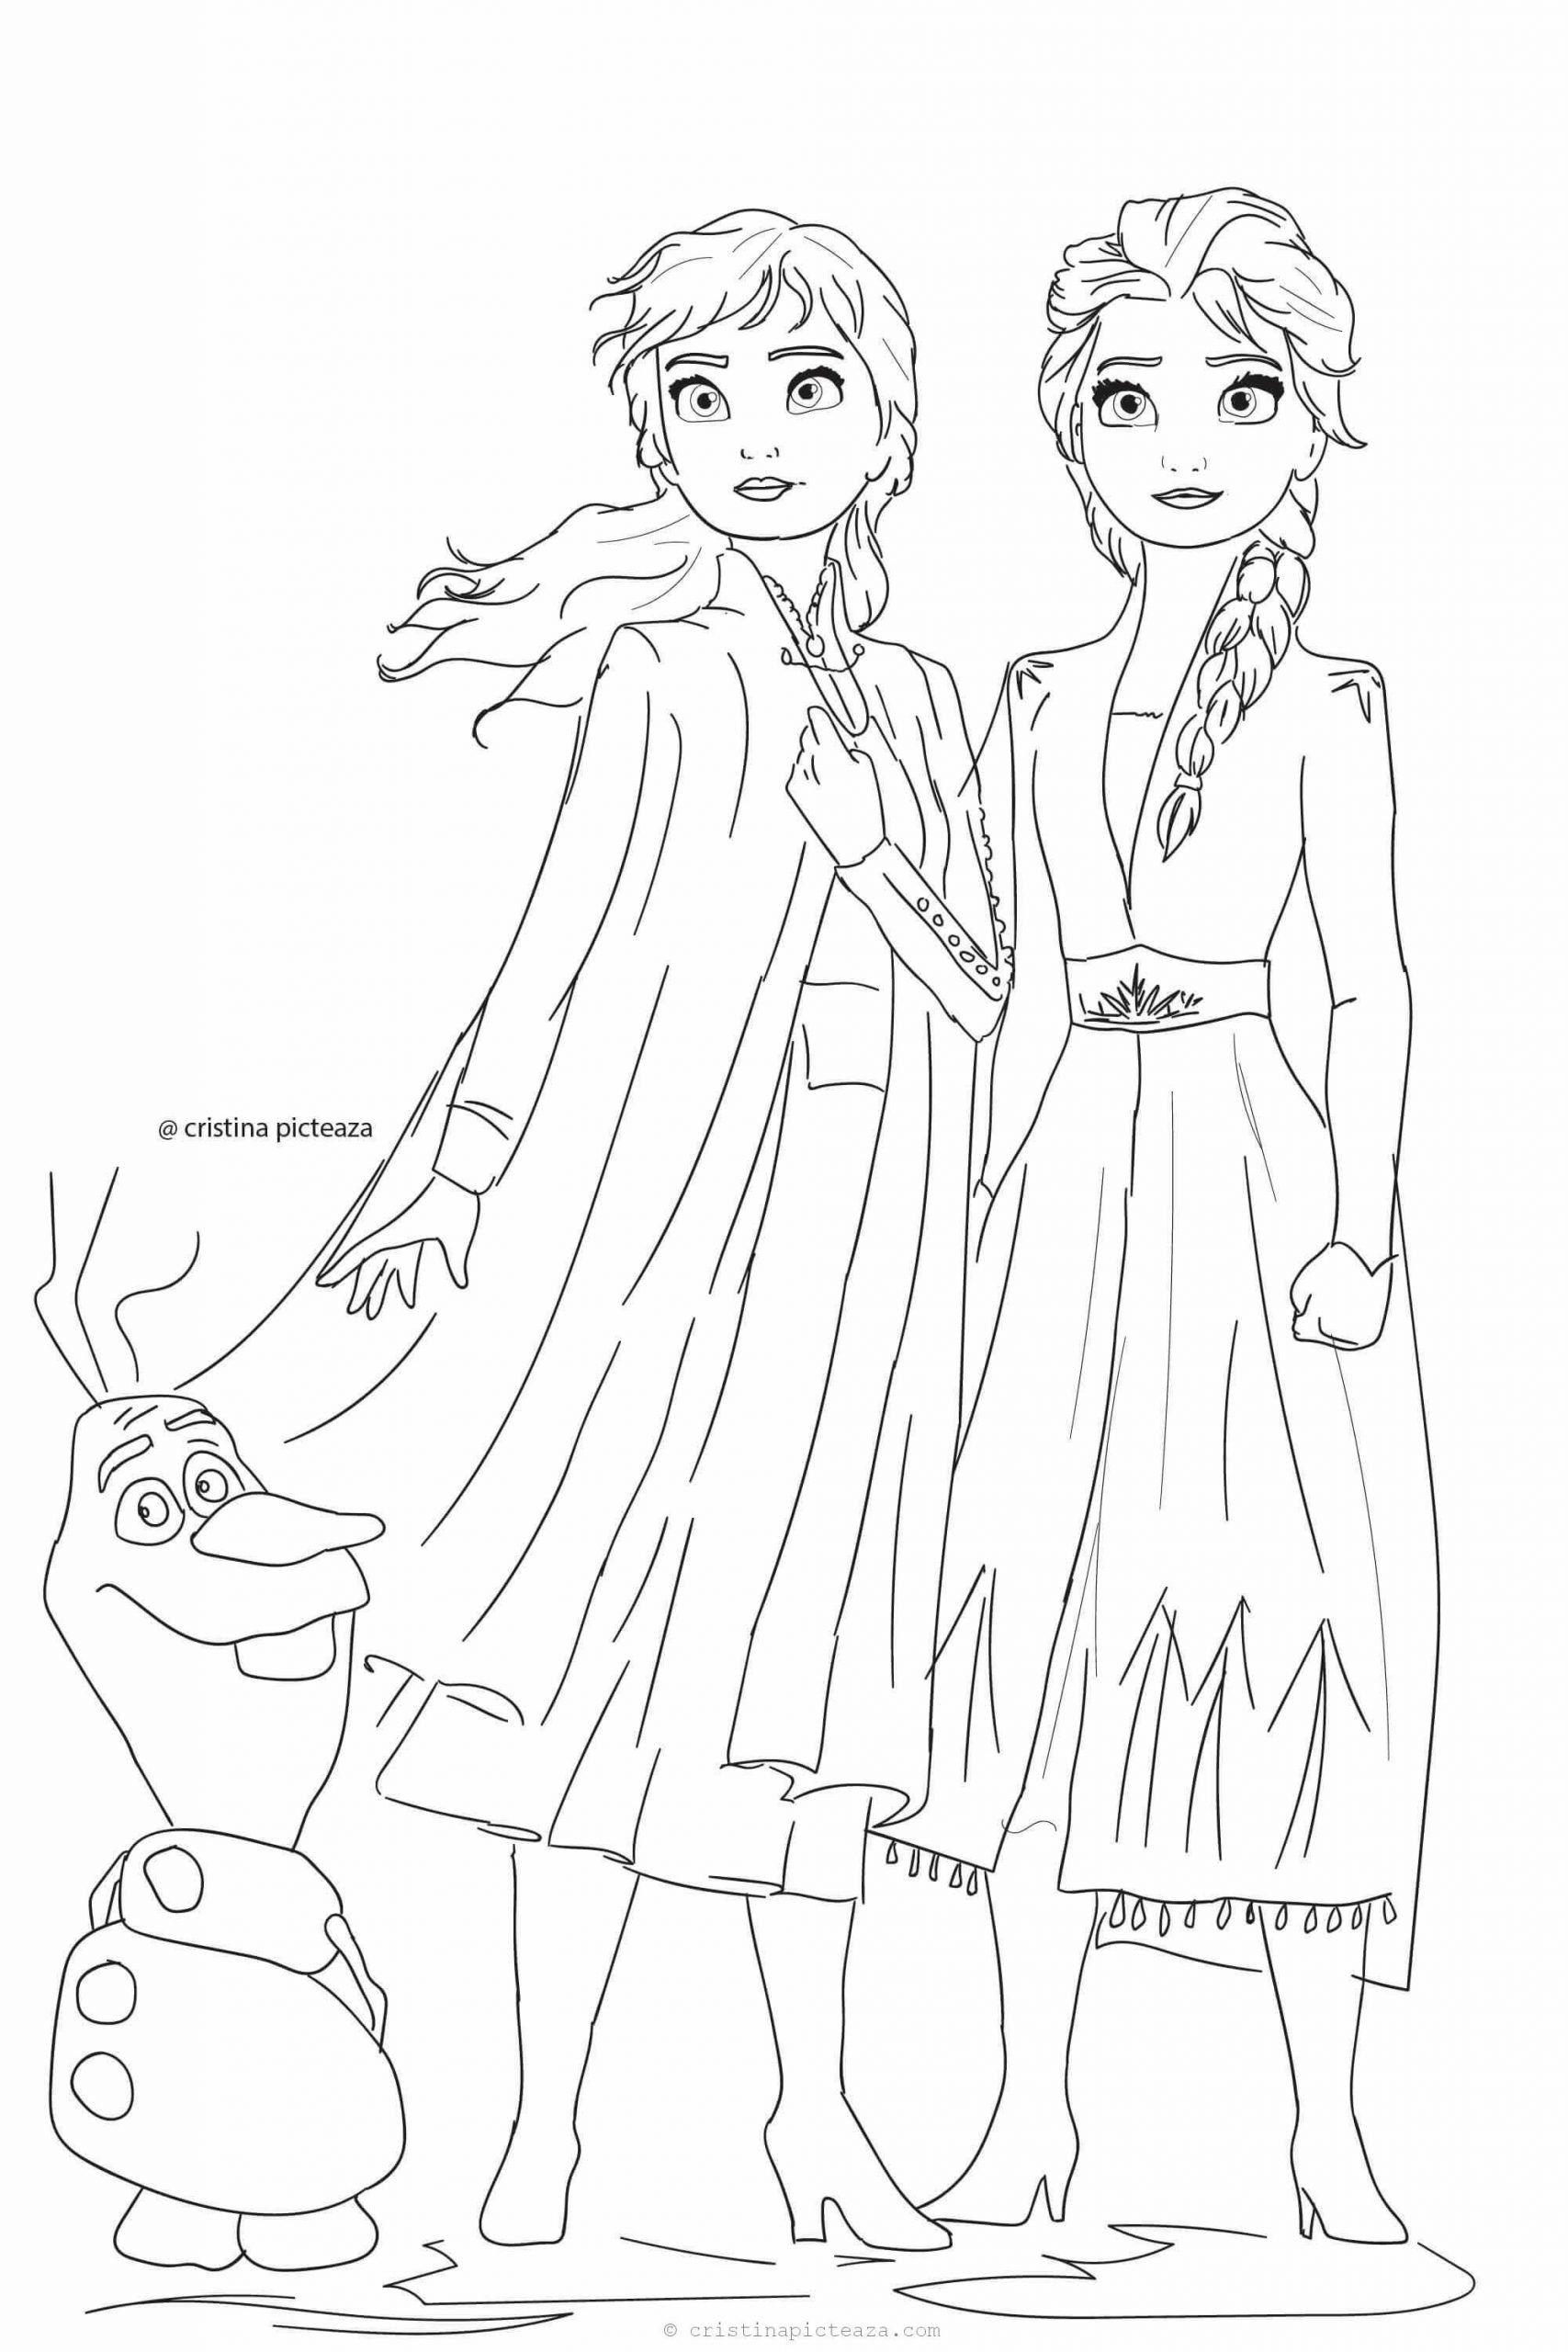 Elsa And Anna Coloring Book Frozen 2 Coloring Pages Ana In 2020 Elsa Coloring Pages Frozen Coloring Pages Disney Princess Coloring Pages [ 2560 x 1707 Pixel ]